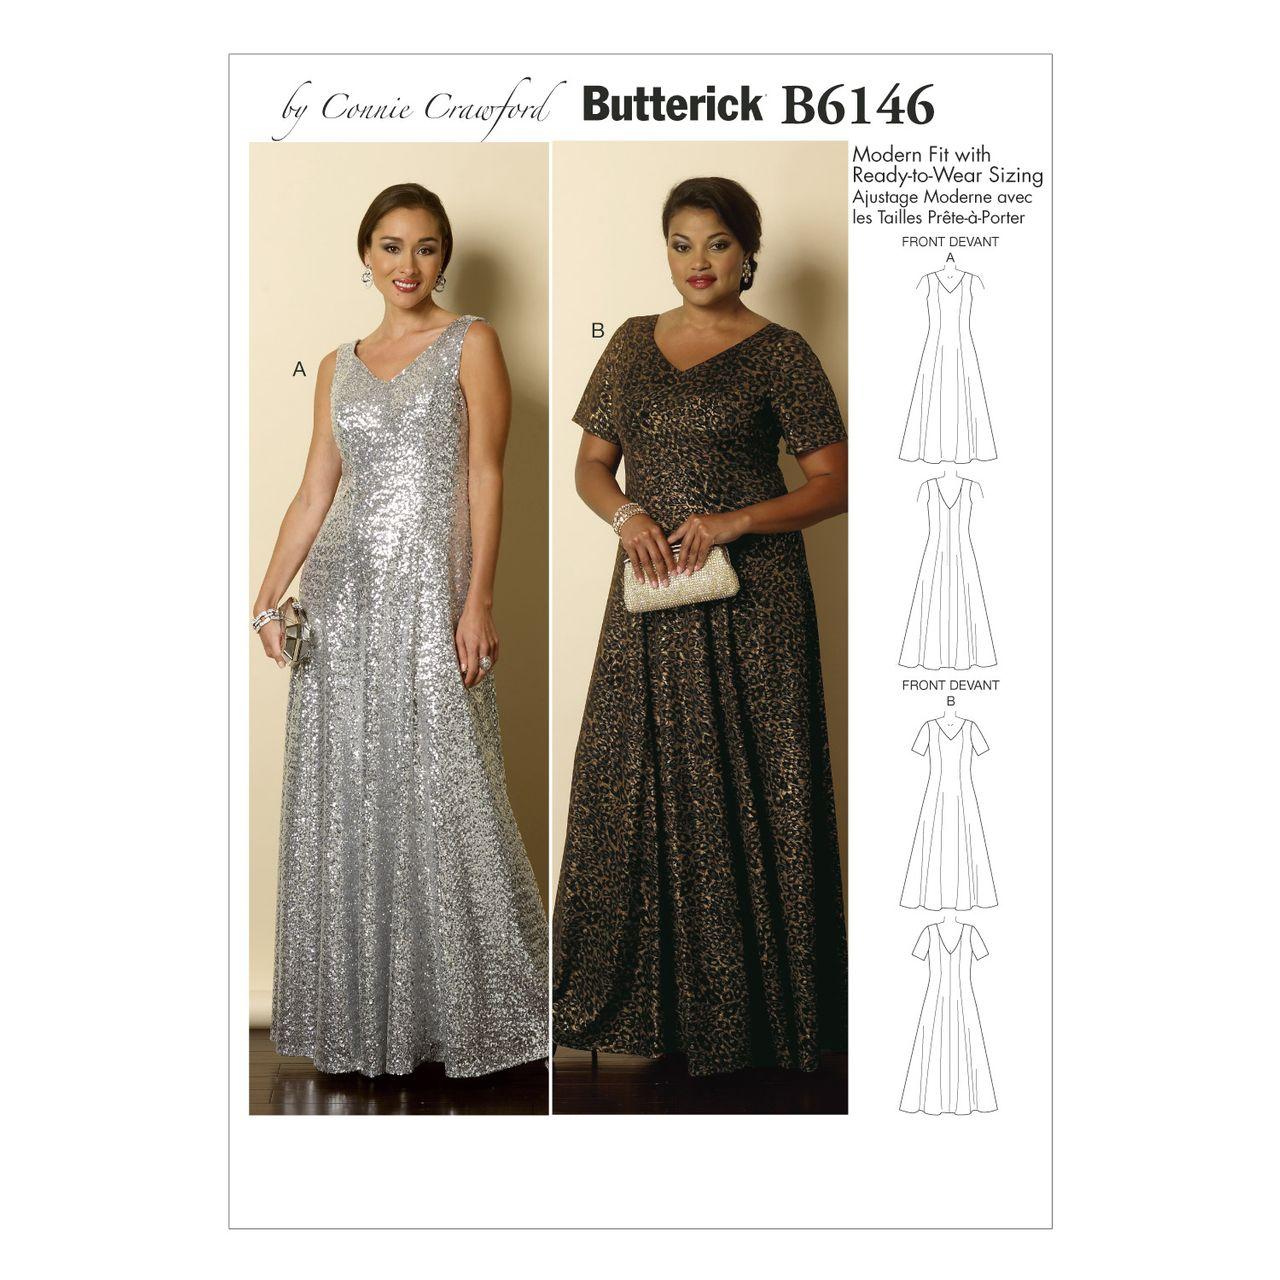 Butterick Schnittmuster 6146 Damen Kleid Alfatex Webshop